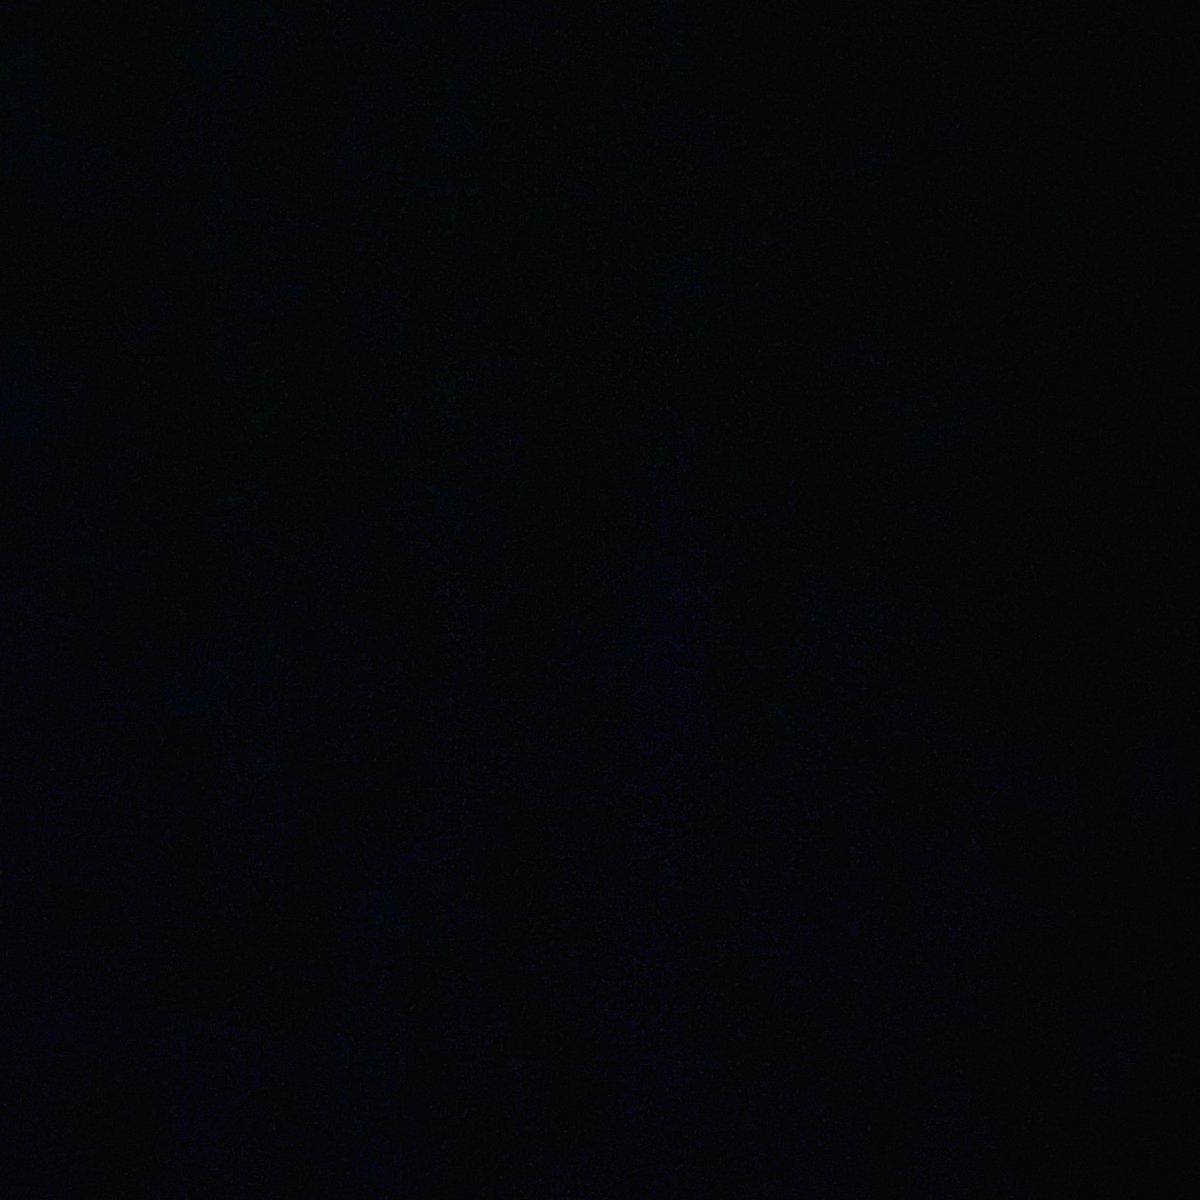 #BlackLivesMatter✊🏿✊🏾✊🏽✊🏼✊🏻#blackouttuesday